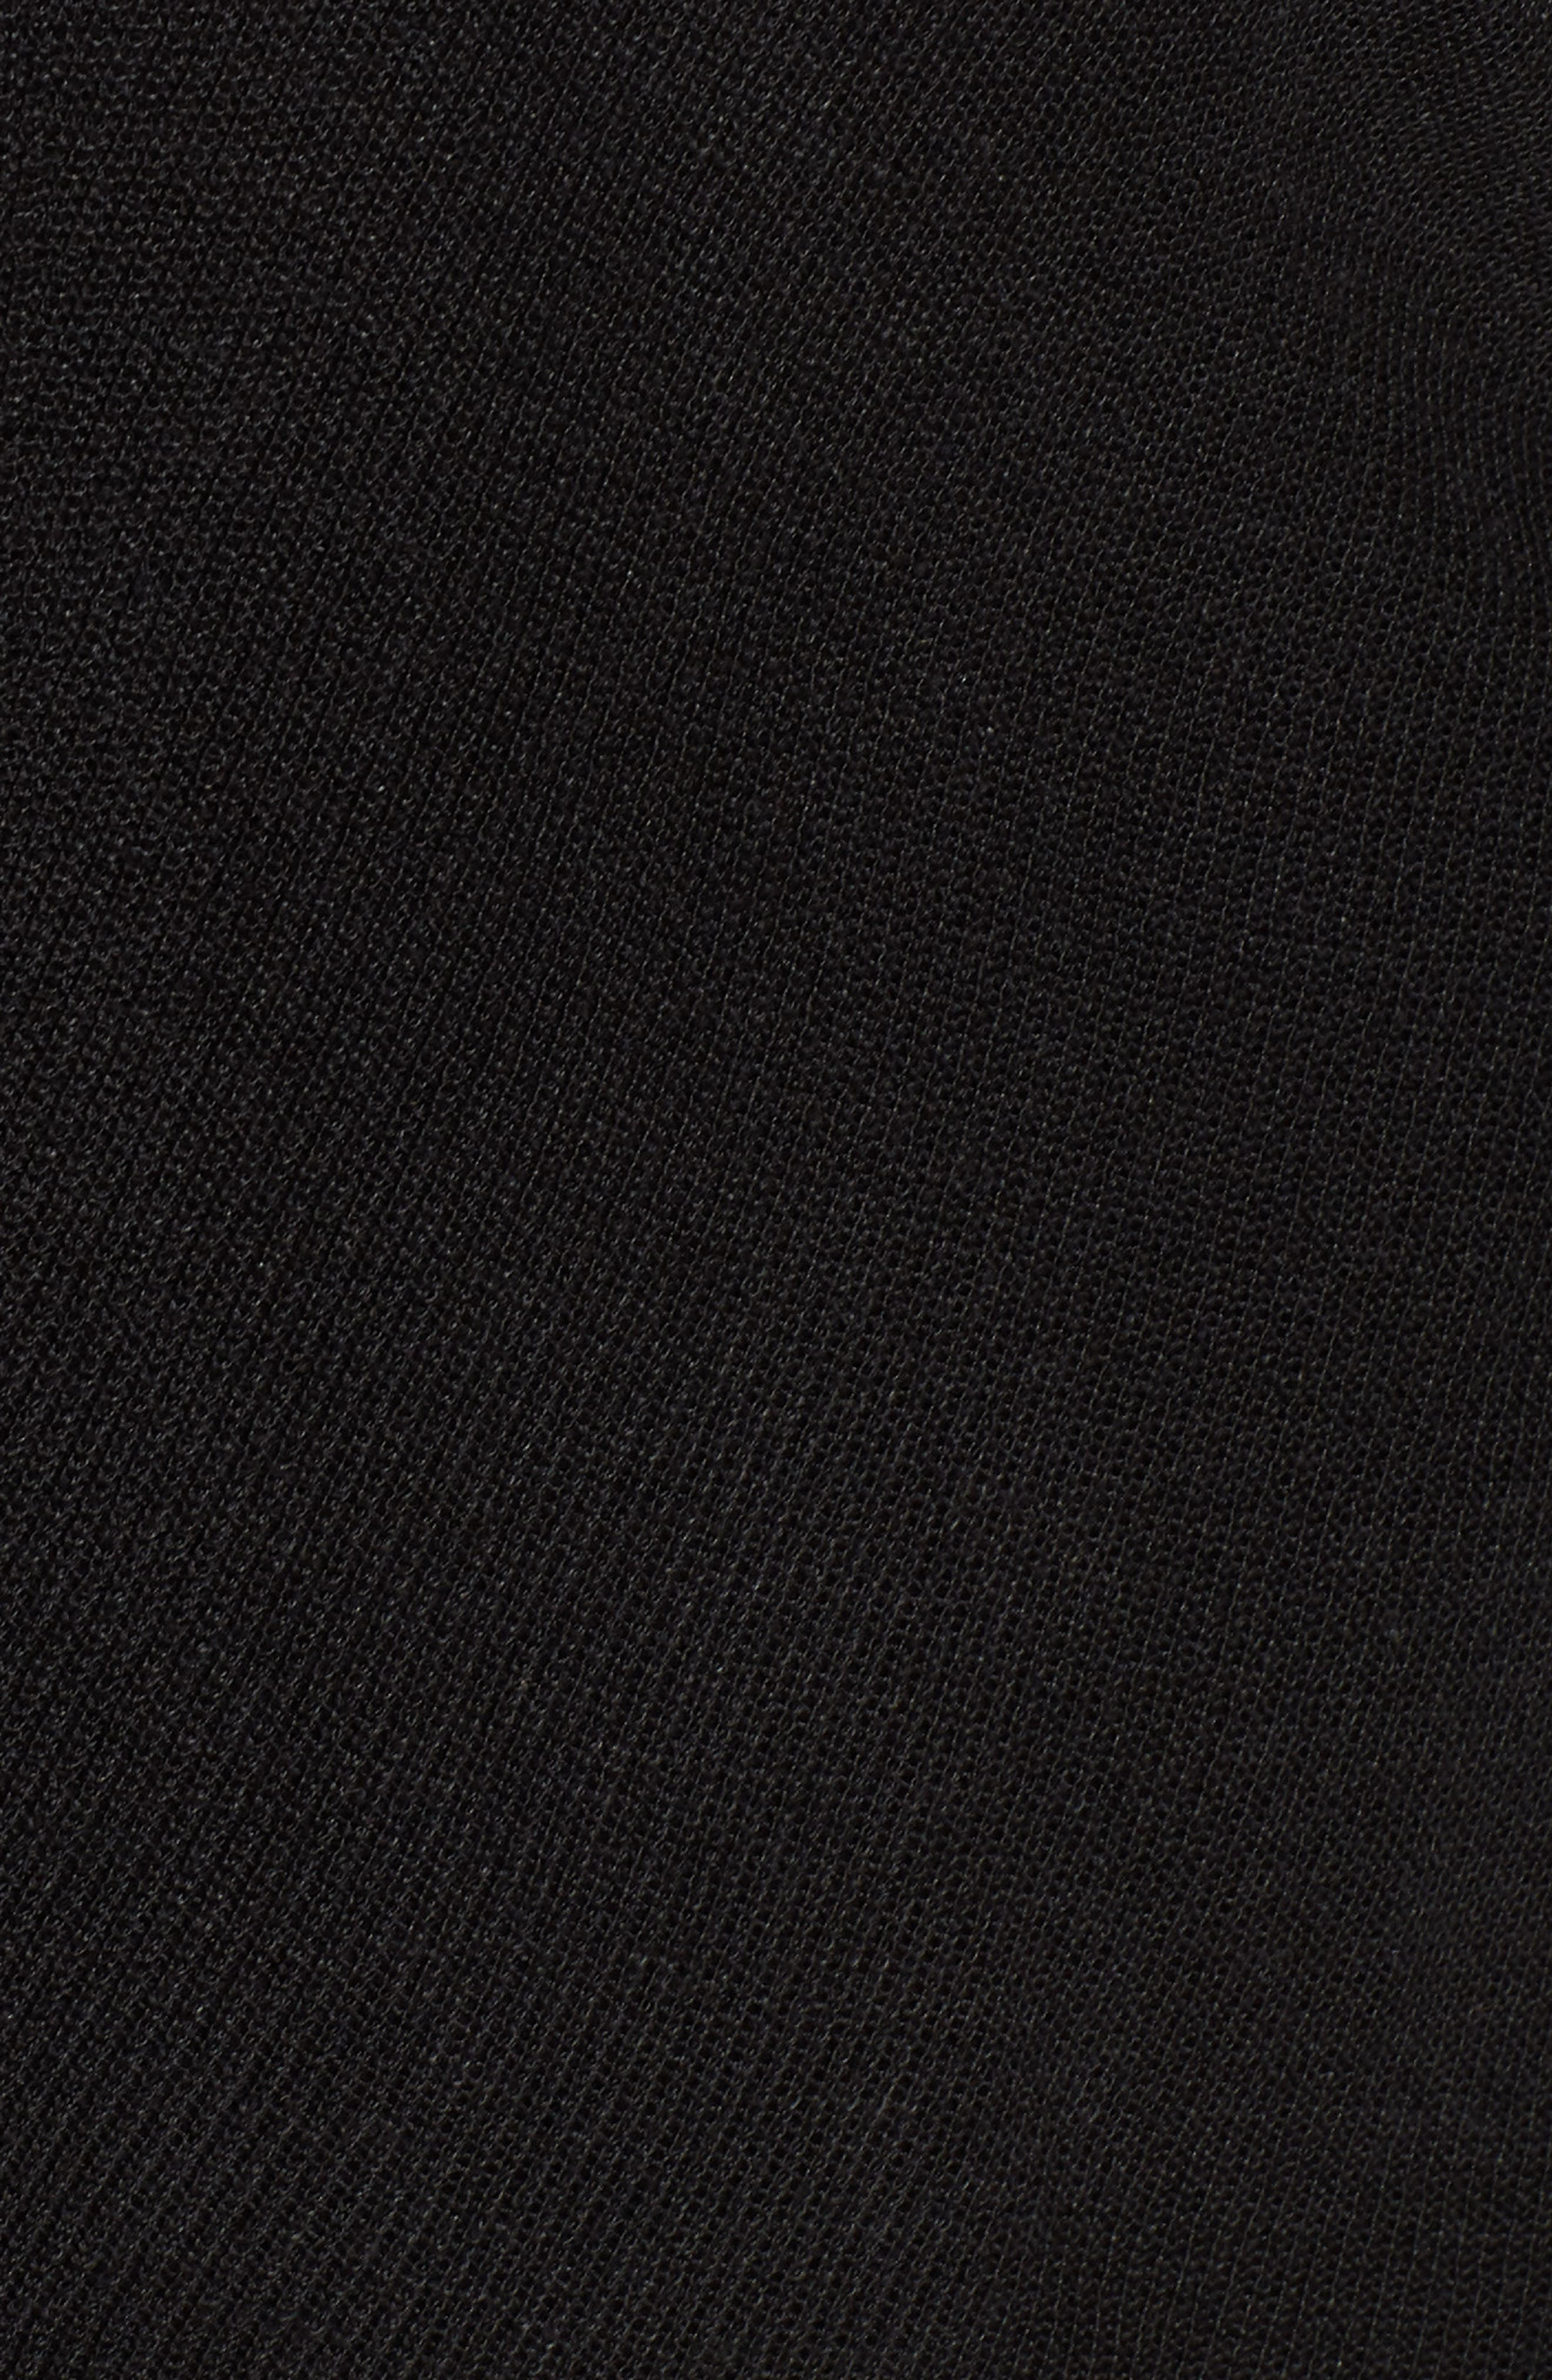 Boxy Organic Linen Blend Sweater,                             Alternate thumbnail 5, color,                             001